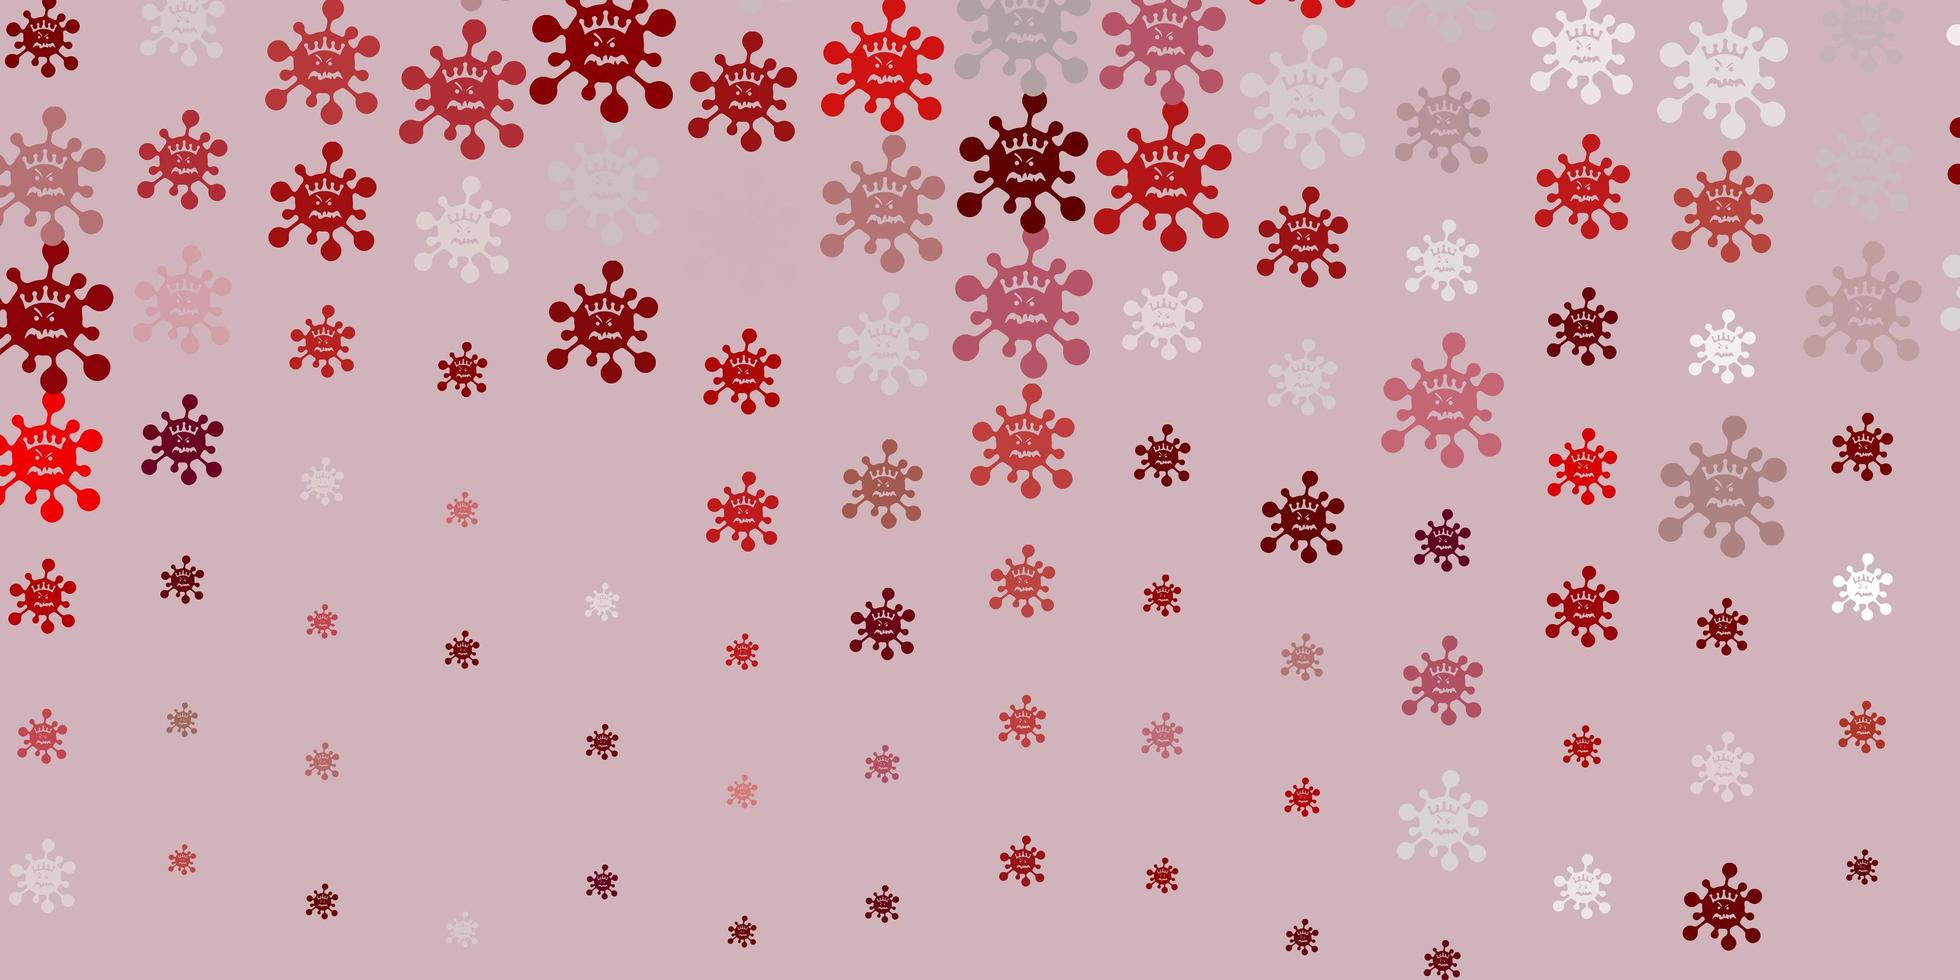 de fundo vector roxo claro com símbolos covid-19.